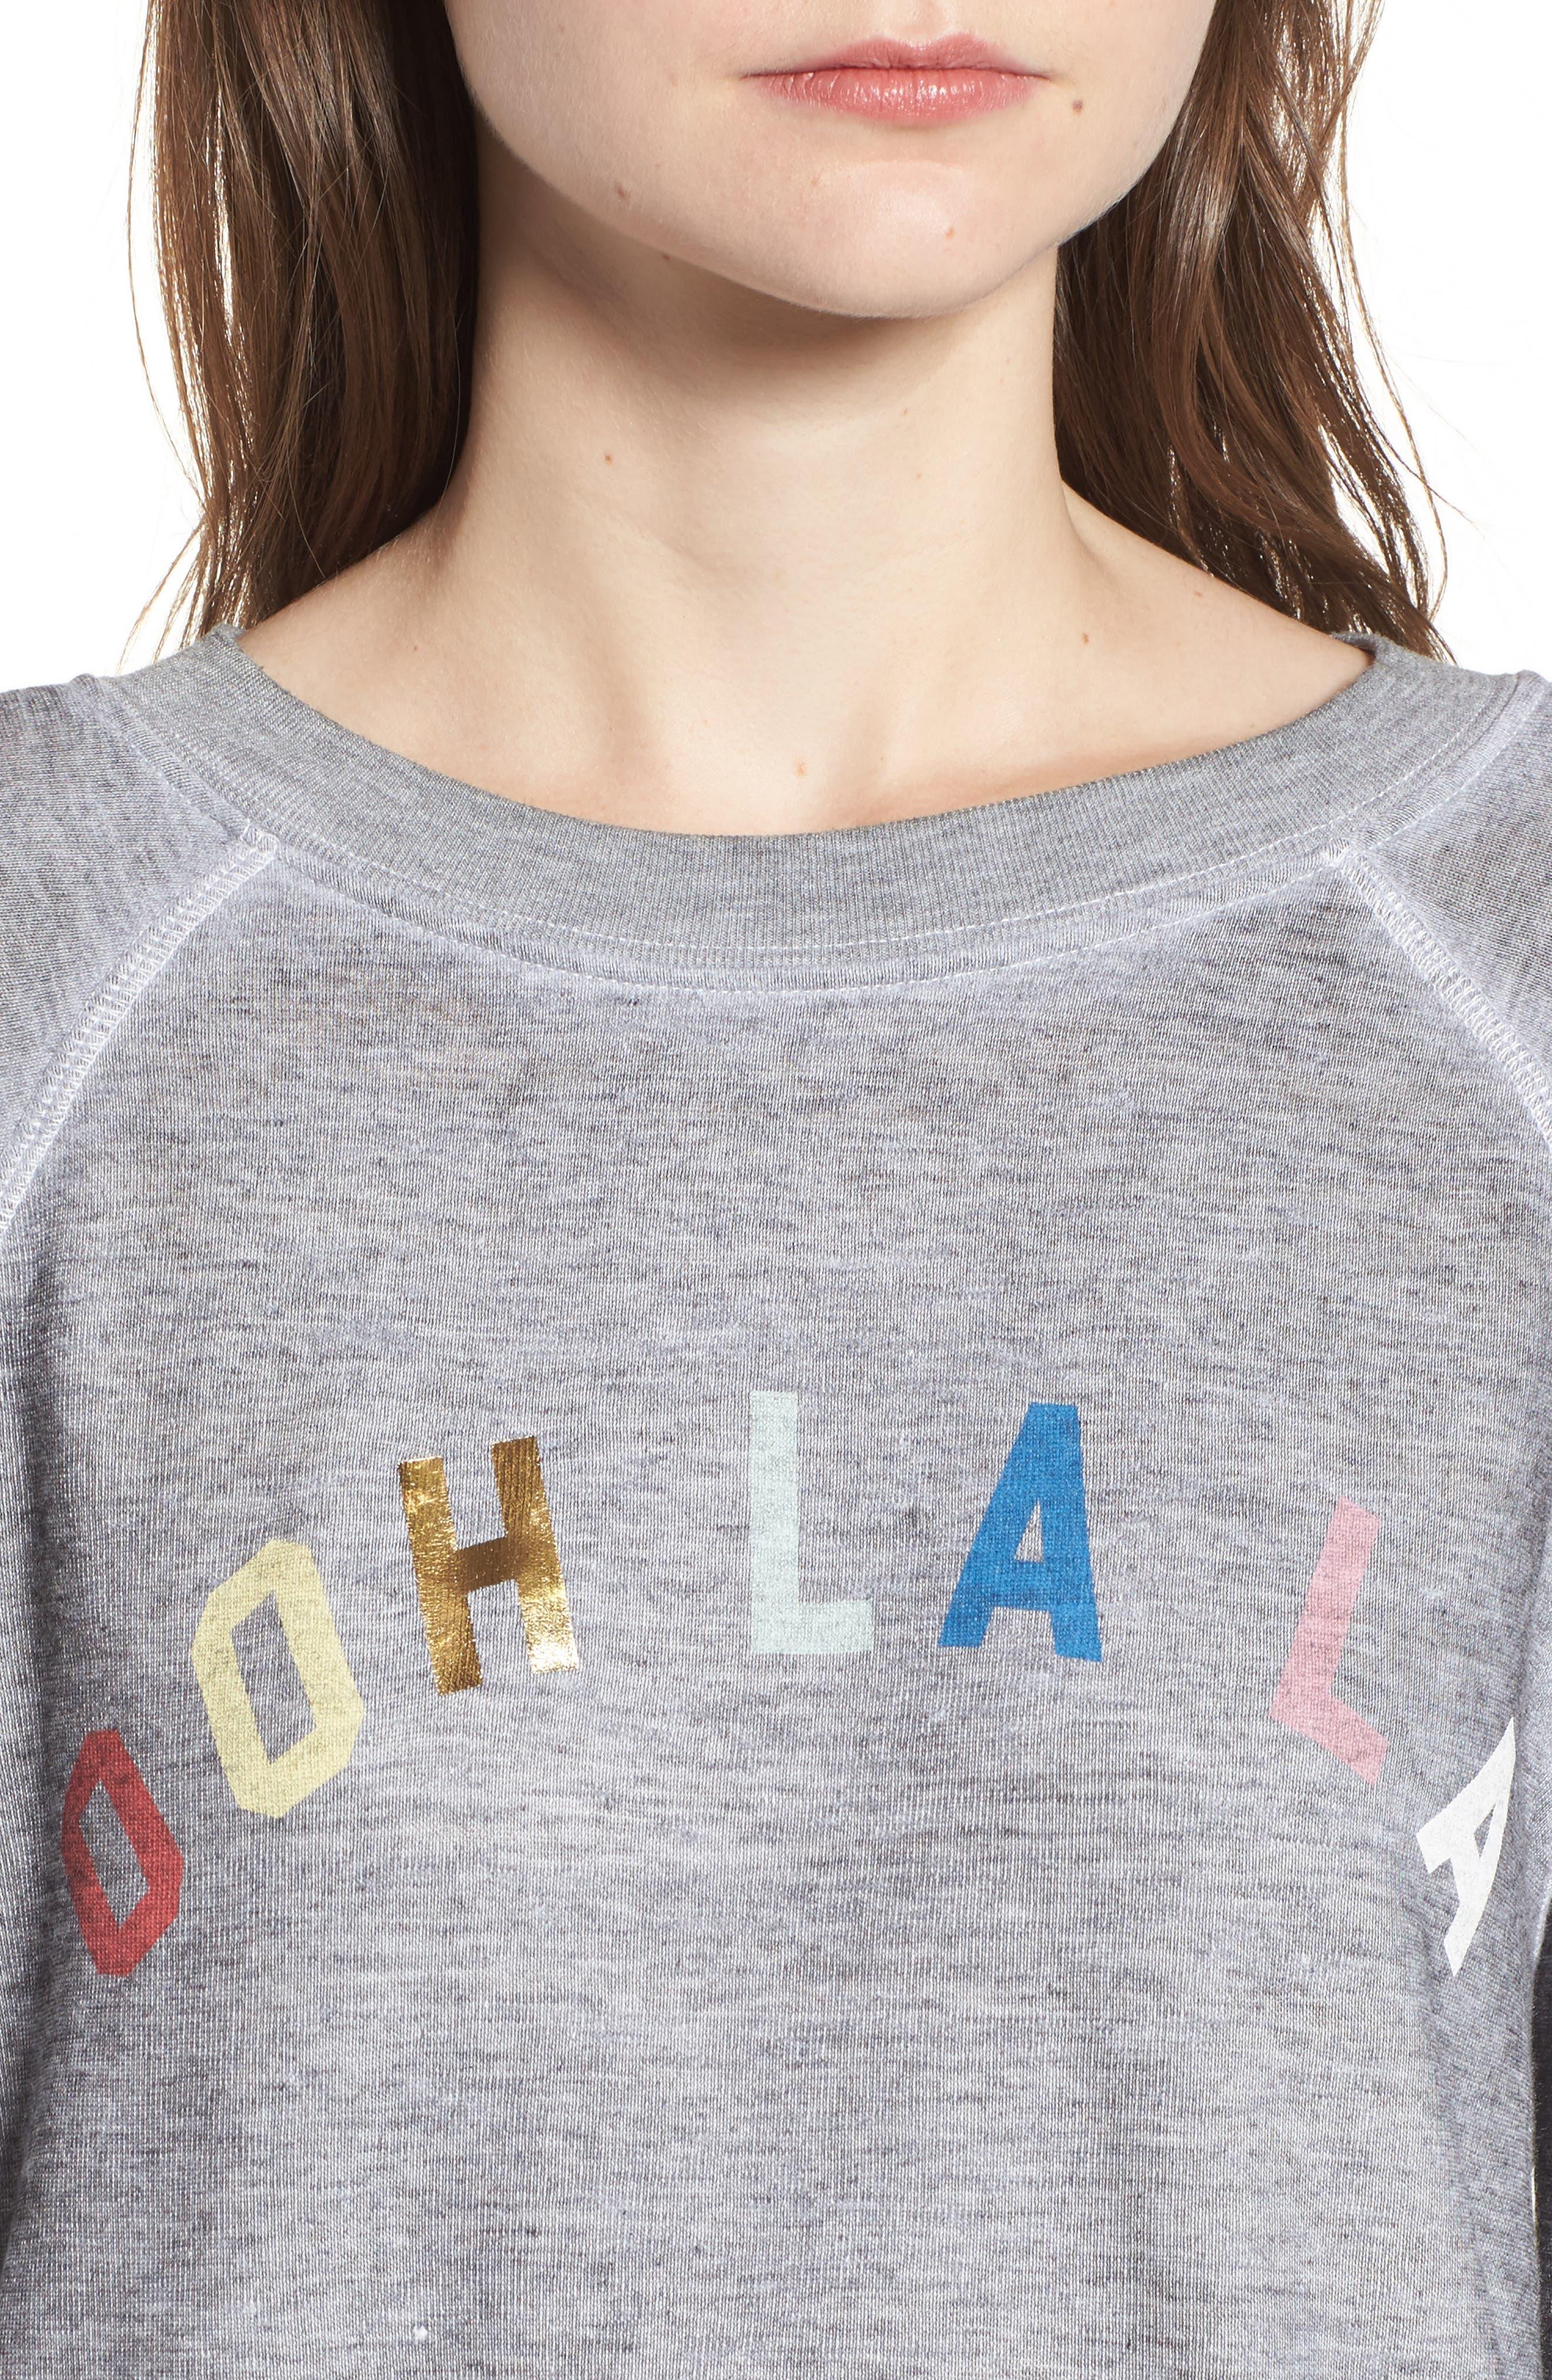 Ooh La La Sweatshirt,                             Alternate thumbnail 4, color,                             Heather